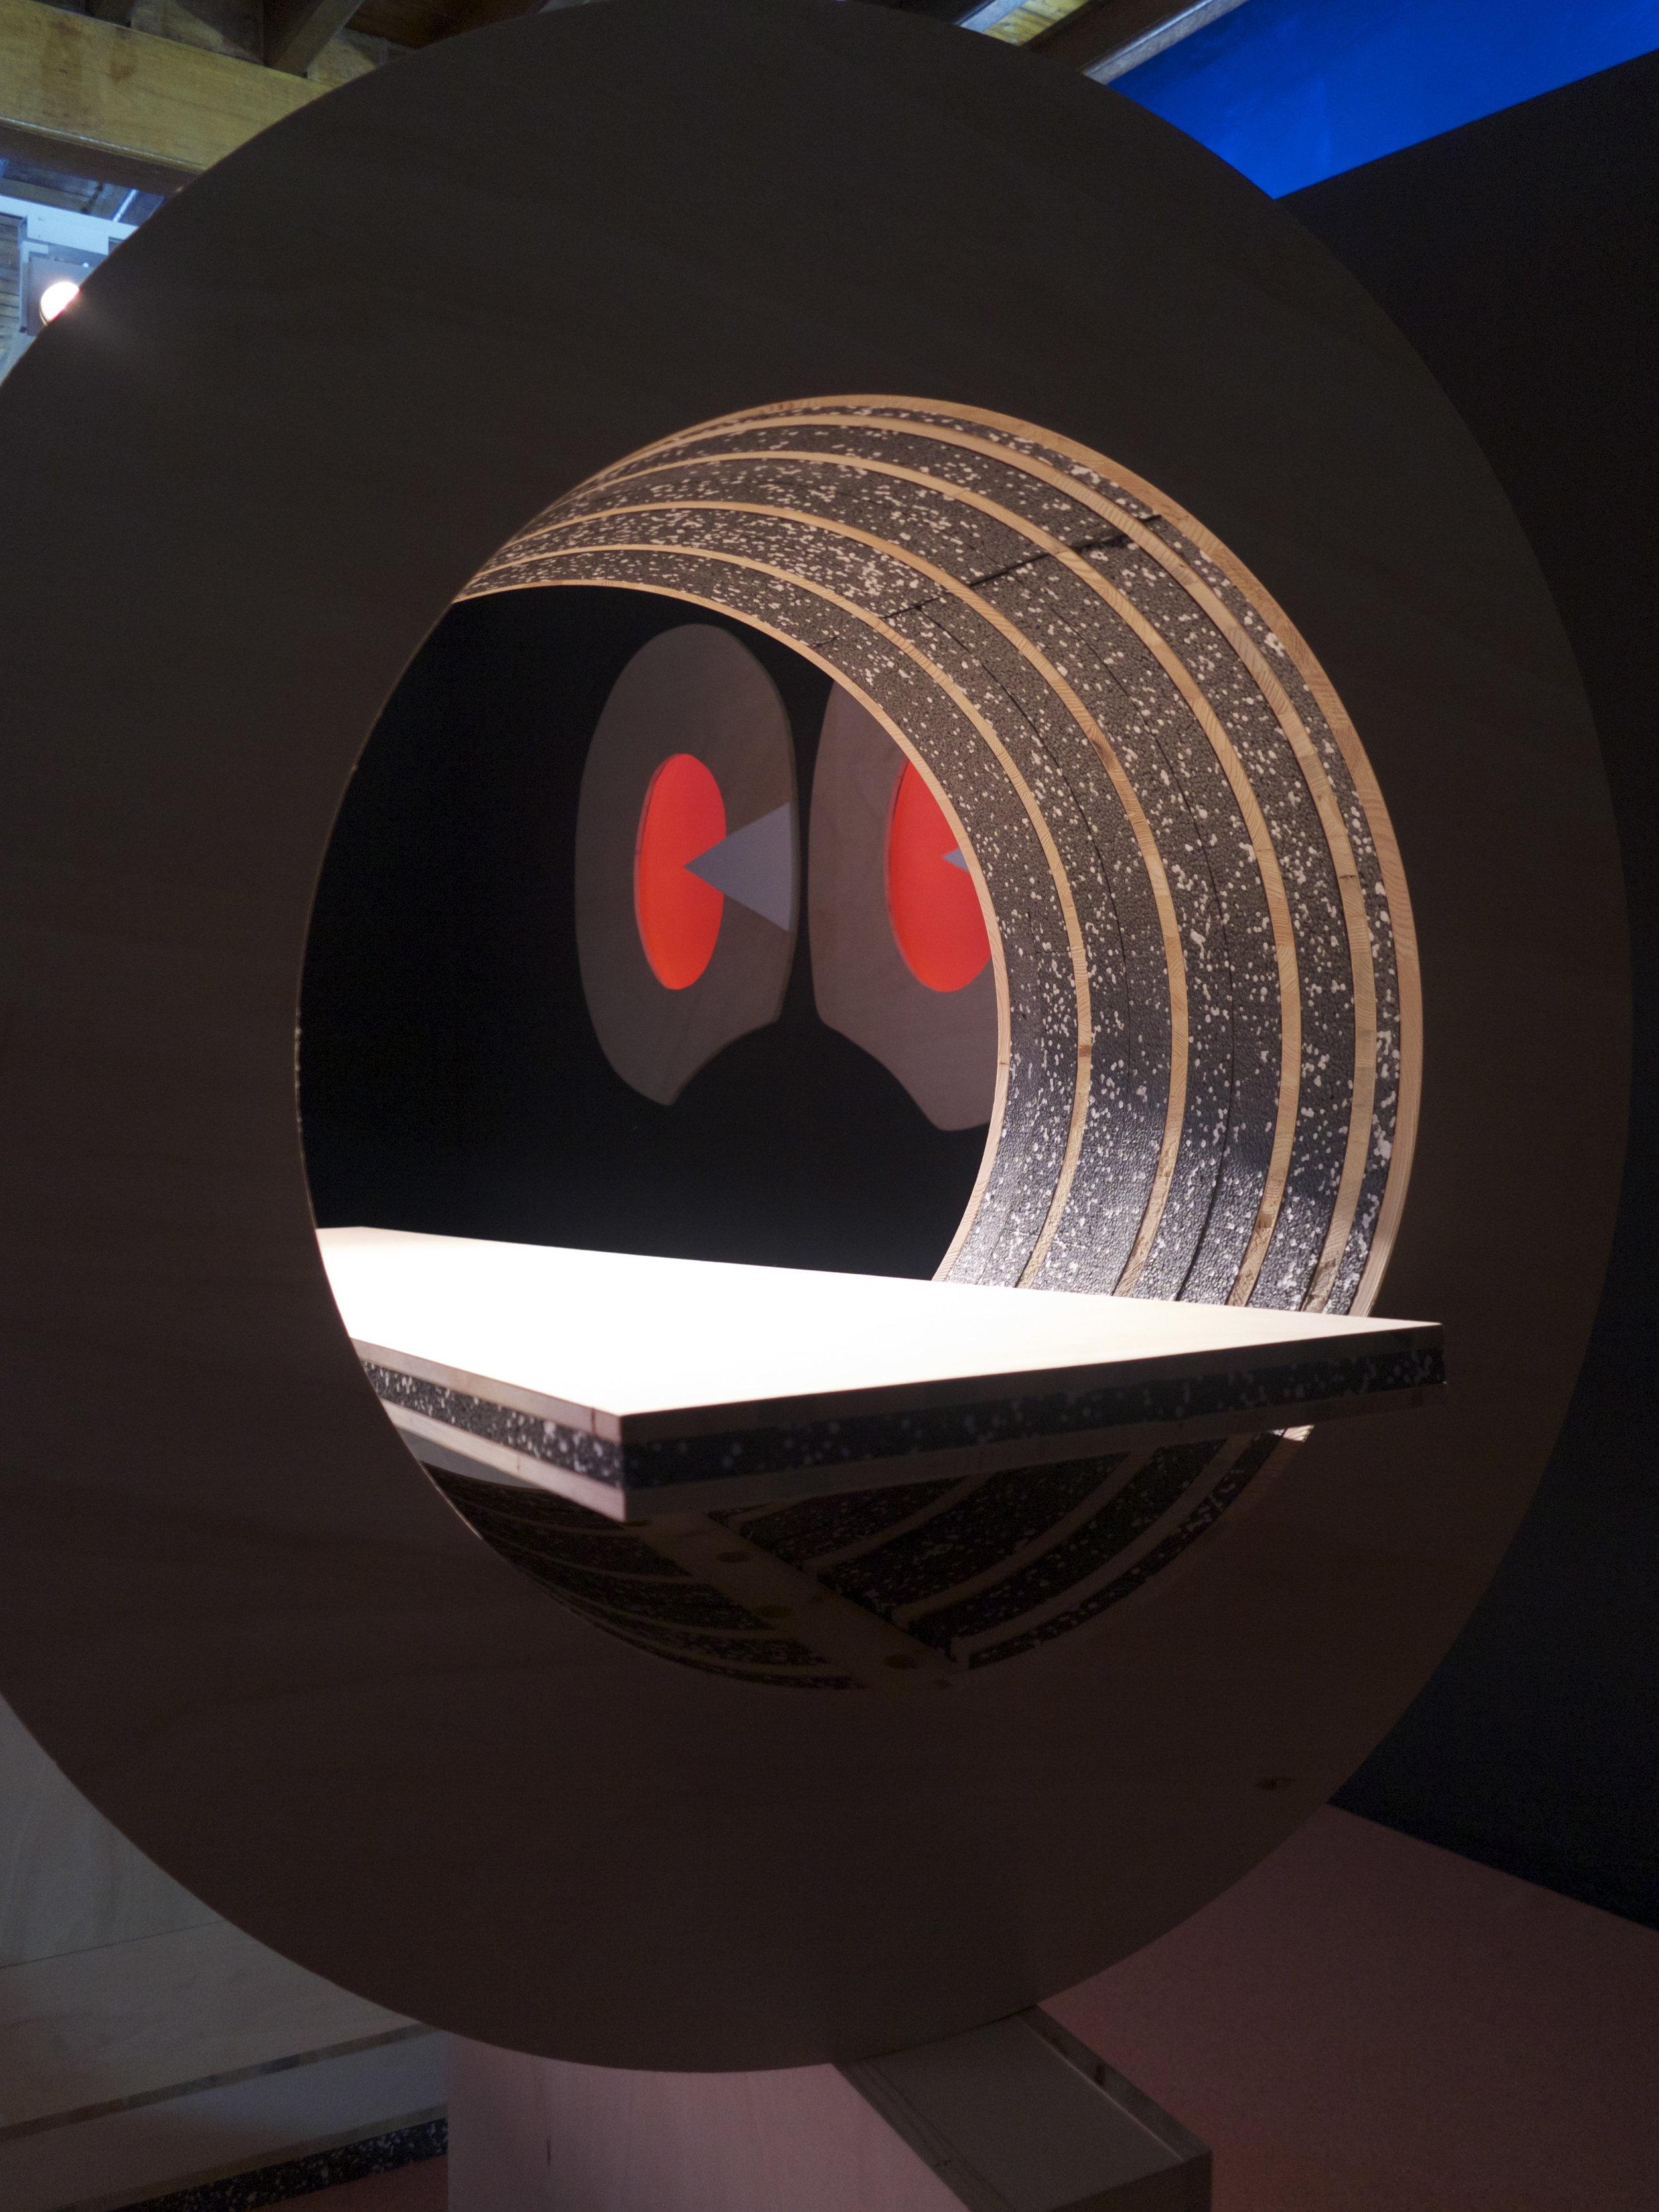 Antedoom installation view from Sharjah Biennial 13, 2017